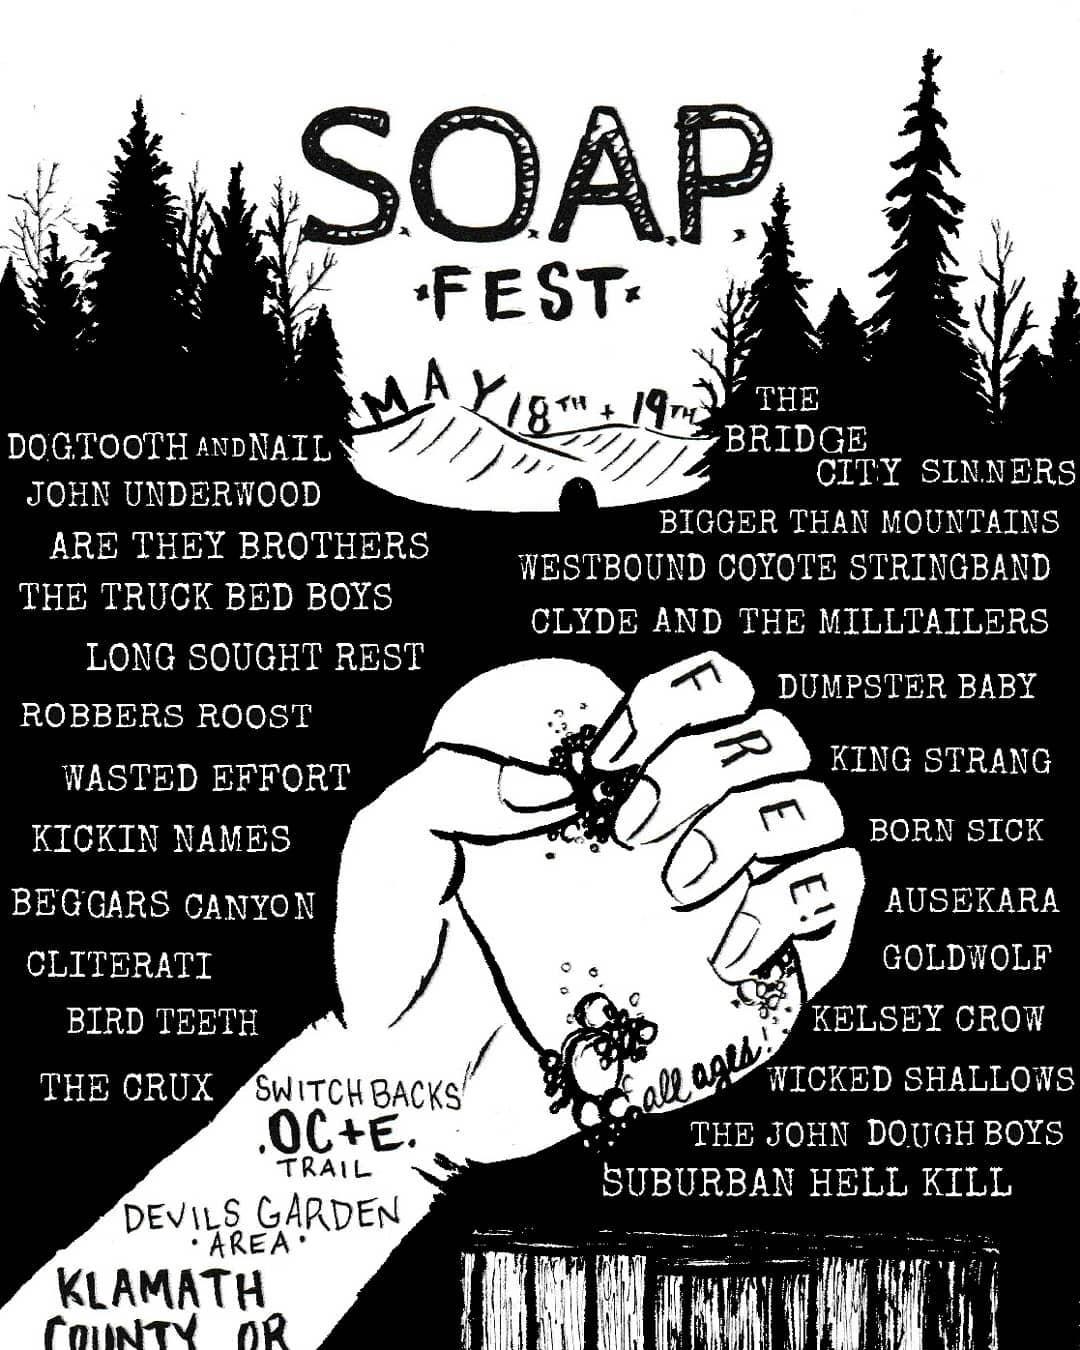 10a4dd6e-a60c-47f3-acaa-b3b35cd28191-jpeg.49860_S.O.A.P. Fest in the woods of Oregon!_Events / Gatherings / Festivals_Squat the Planet_12:57 PM